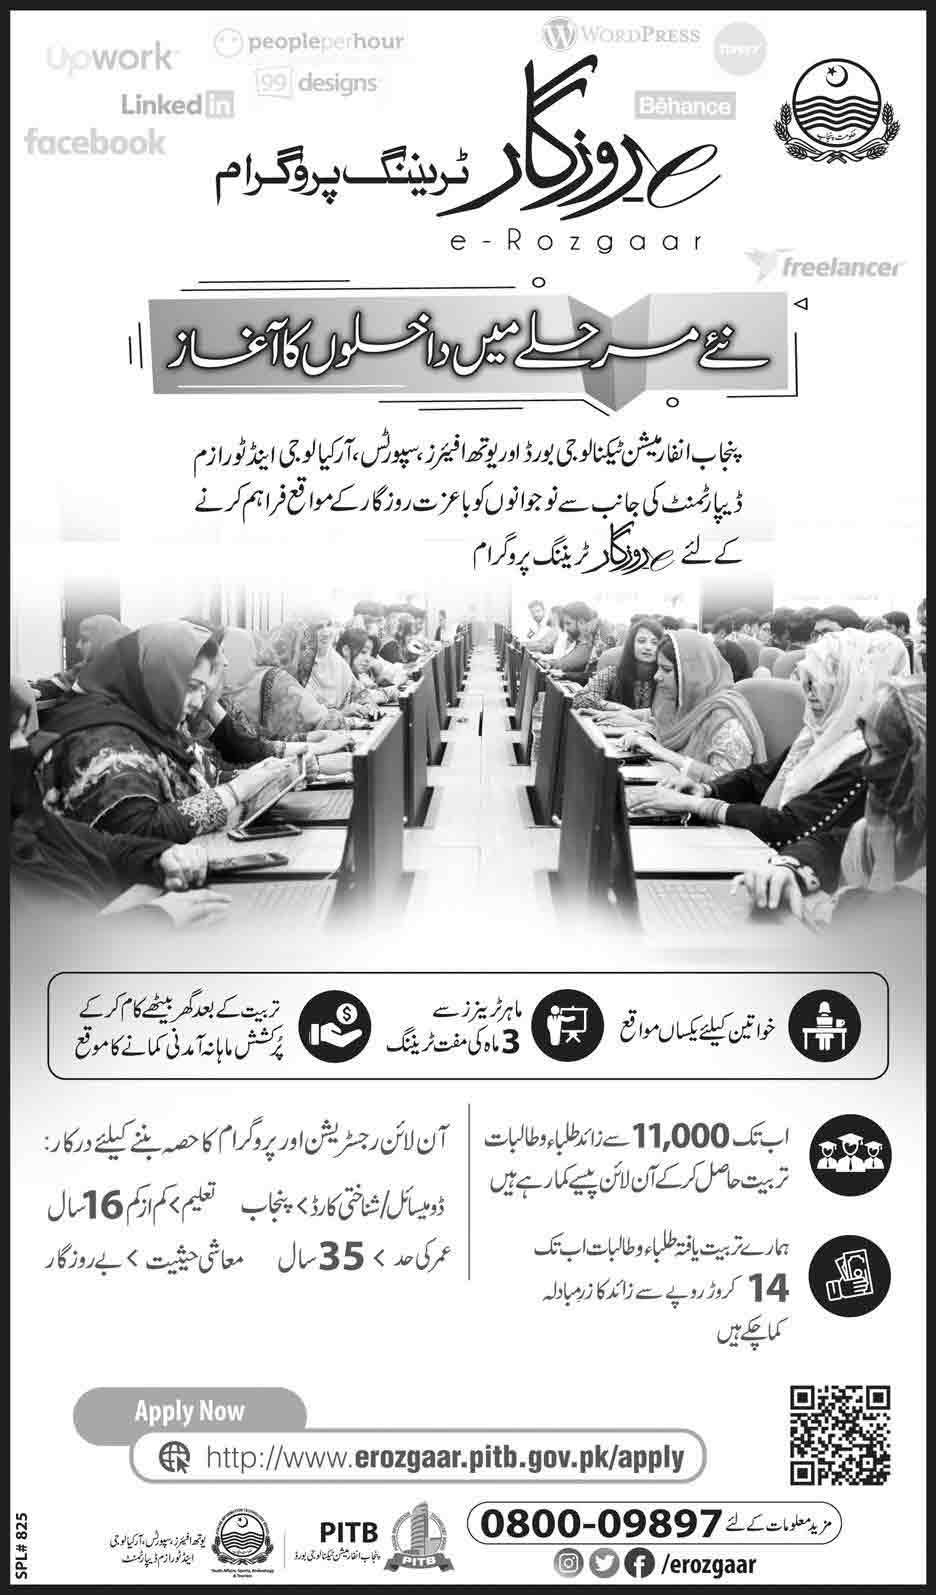 Punjab-E-rozgaar-Training-Program